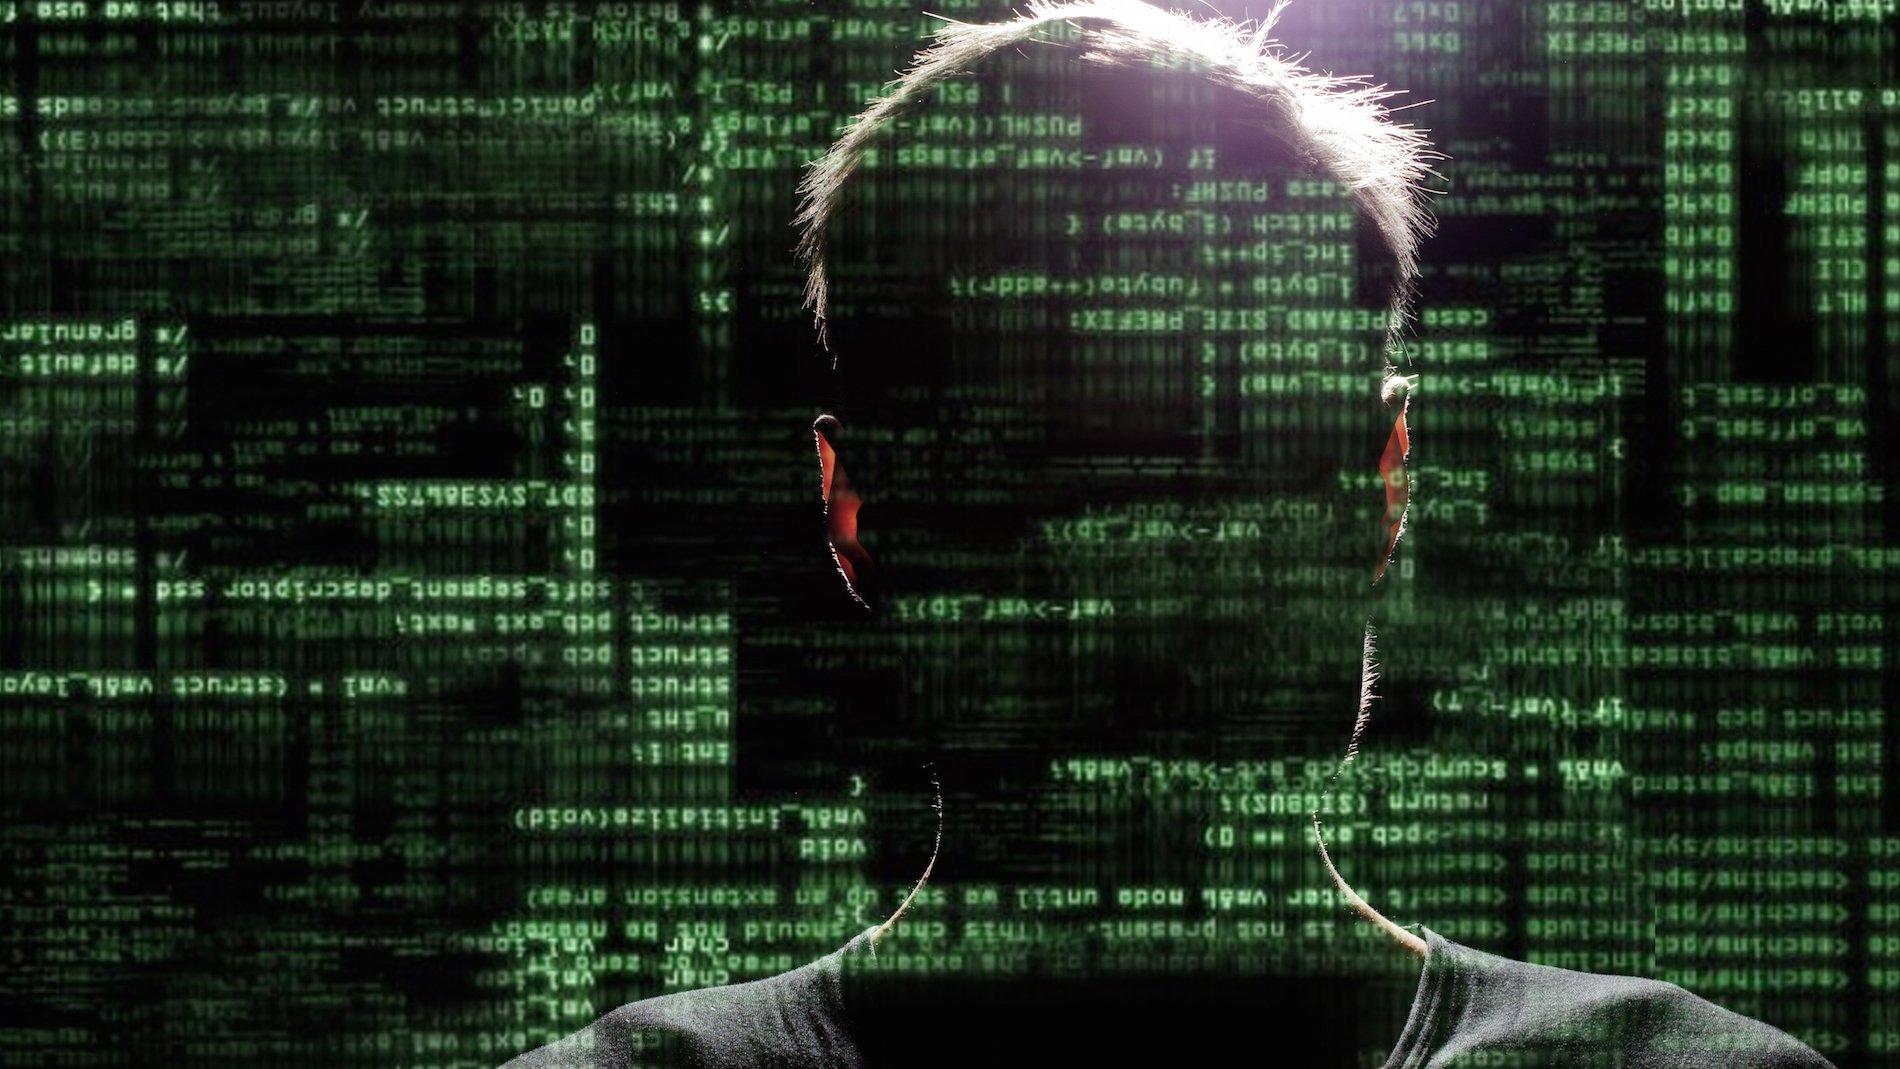 hacker-hack-hacking-internet-computer-anarchy-sadic-virus-dark-anonymous-code-binary-wallpaper-6